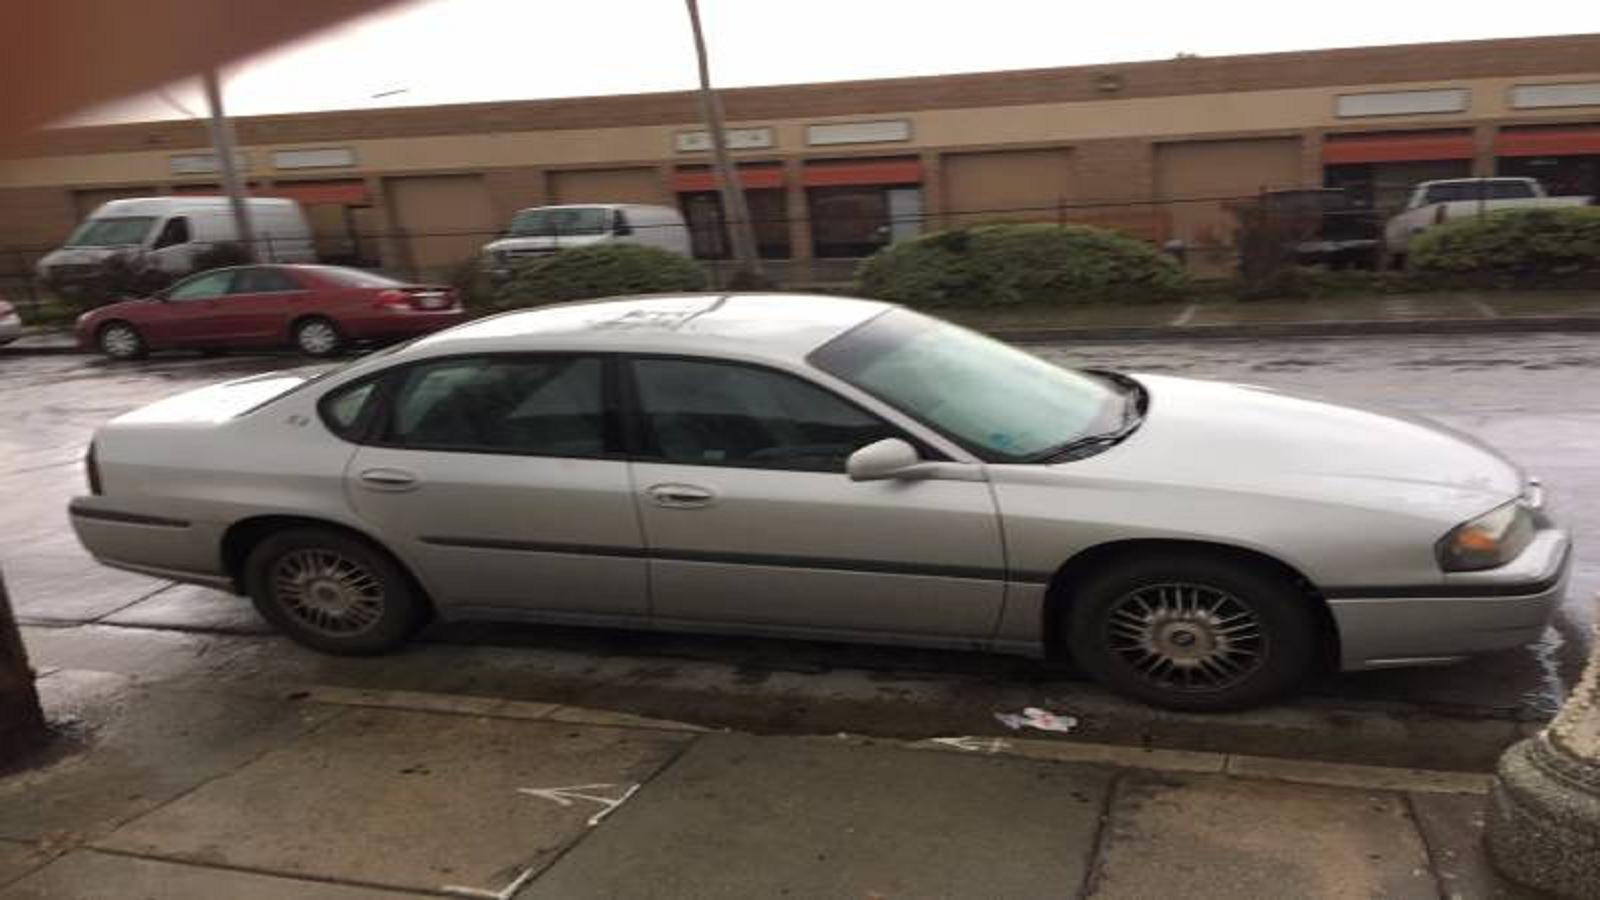 A 2000 Chevrolet Impala ($500)